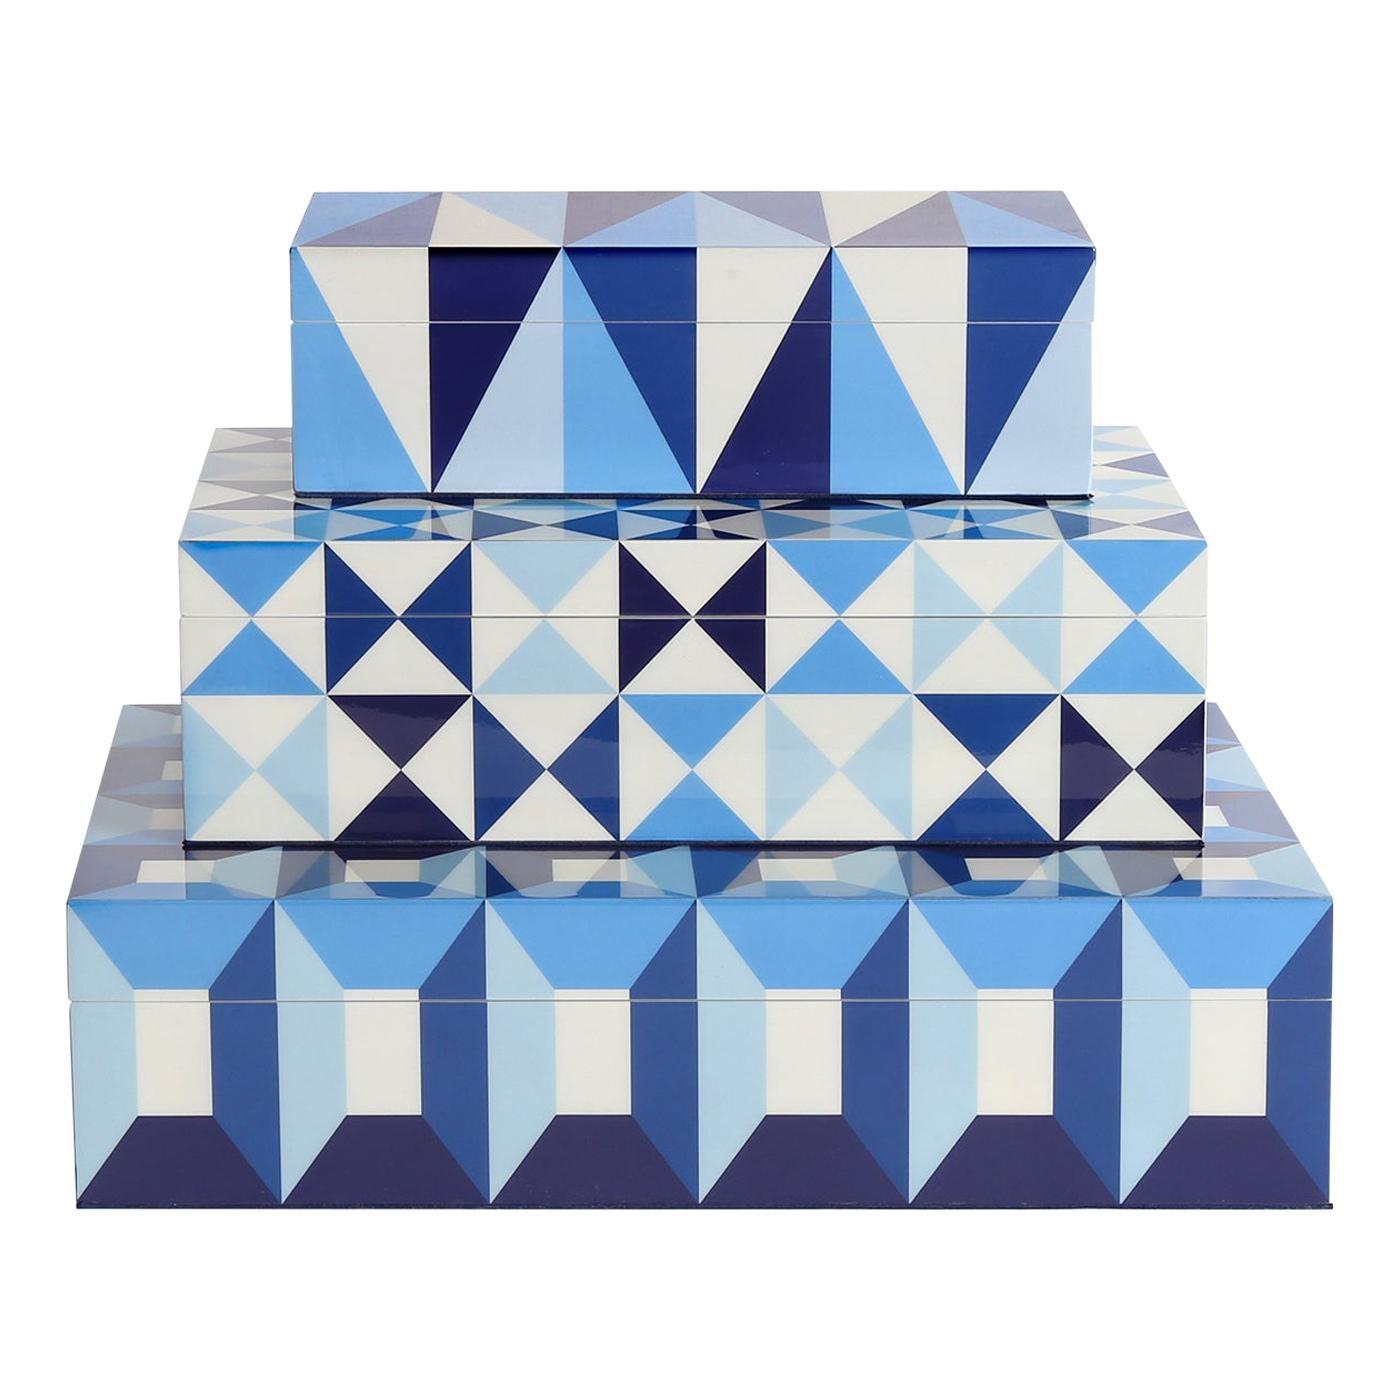 Sorrento Lacquer Box Set